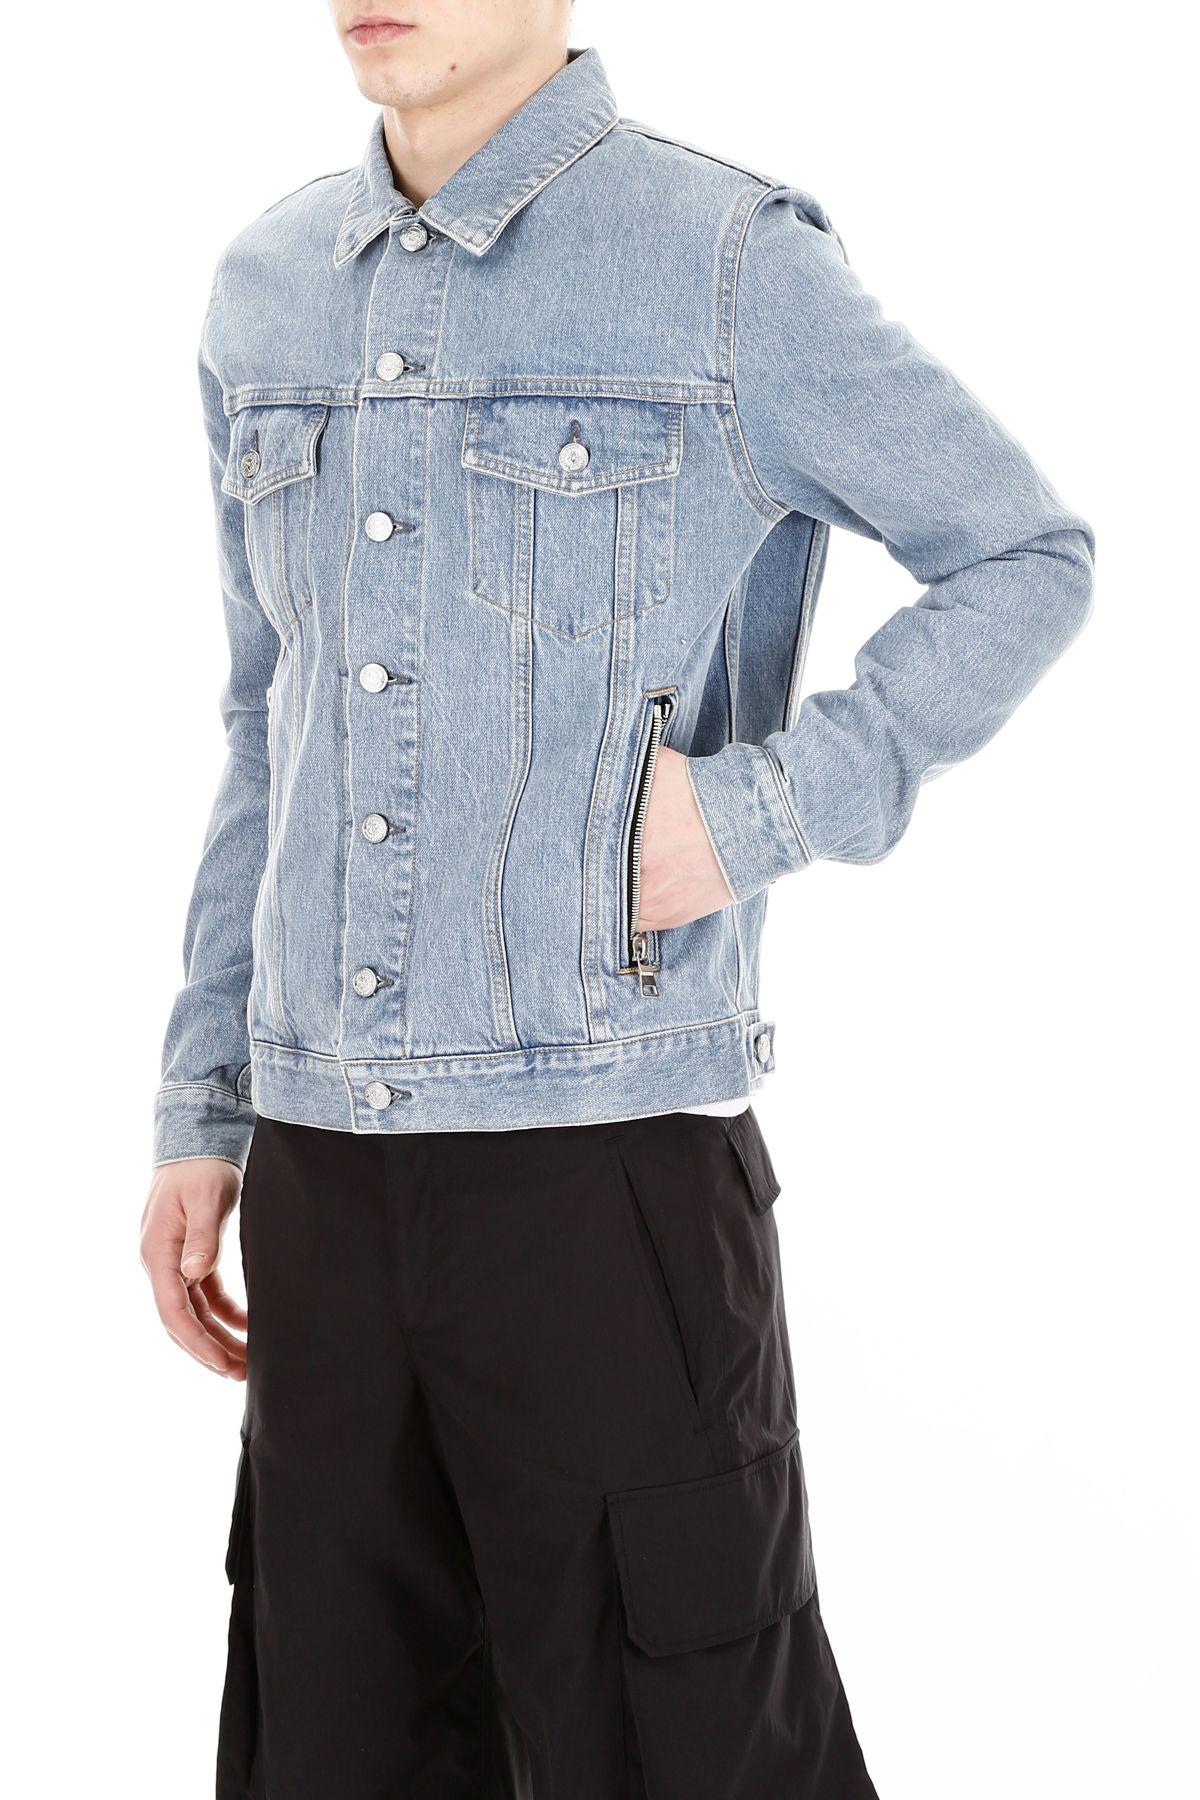 21118b63 Balmain Balmain Denim Jacket With Logo Embroidery - BLEU (Light blue ...